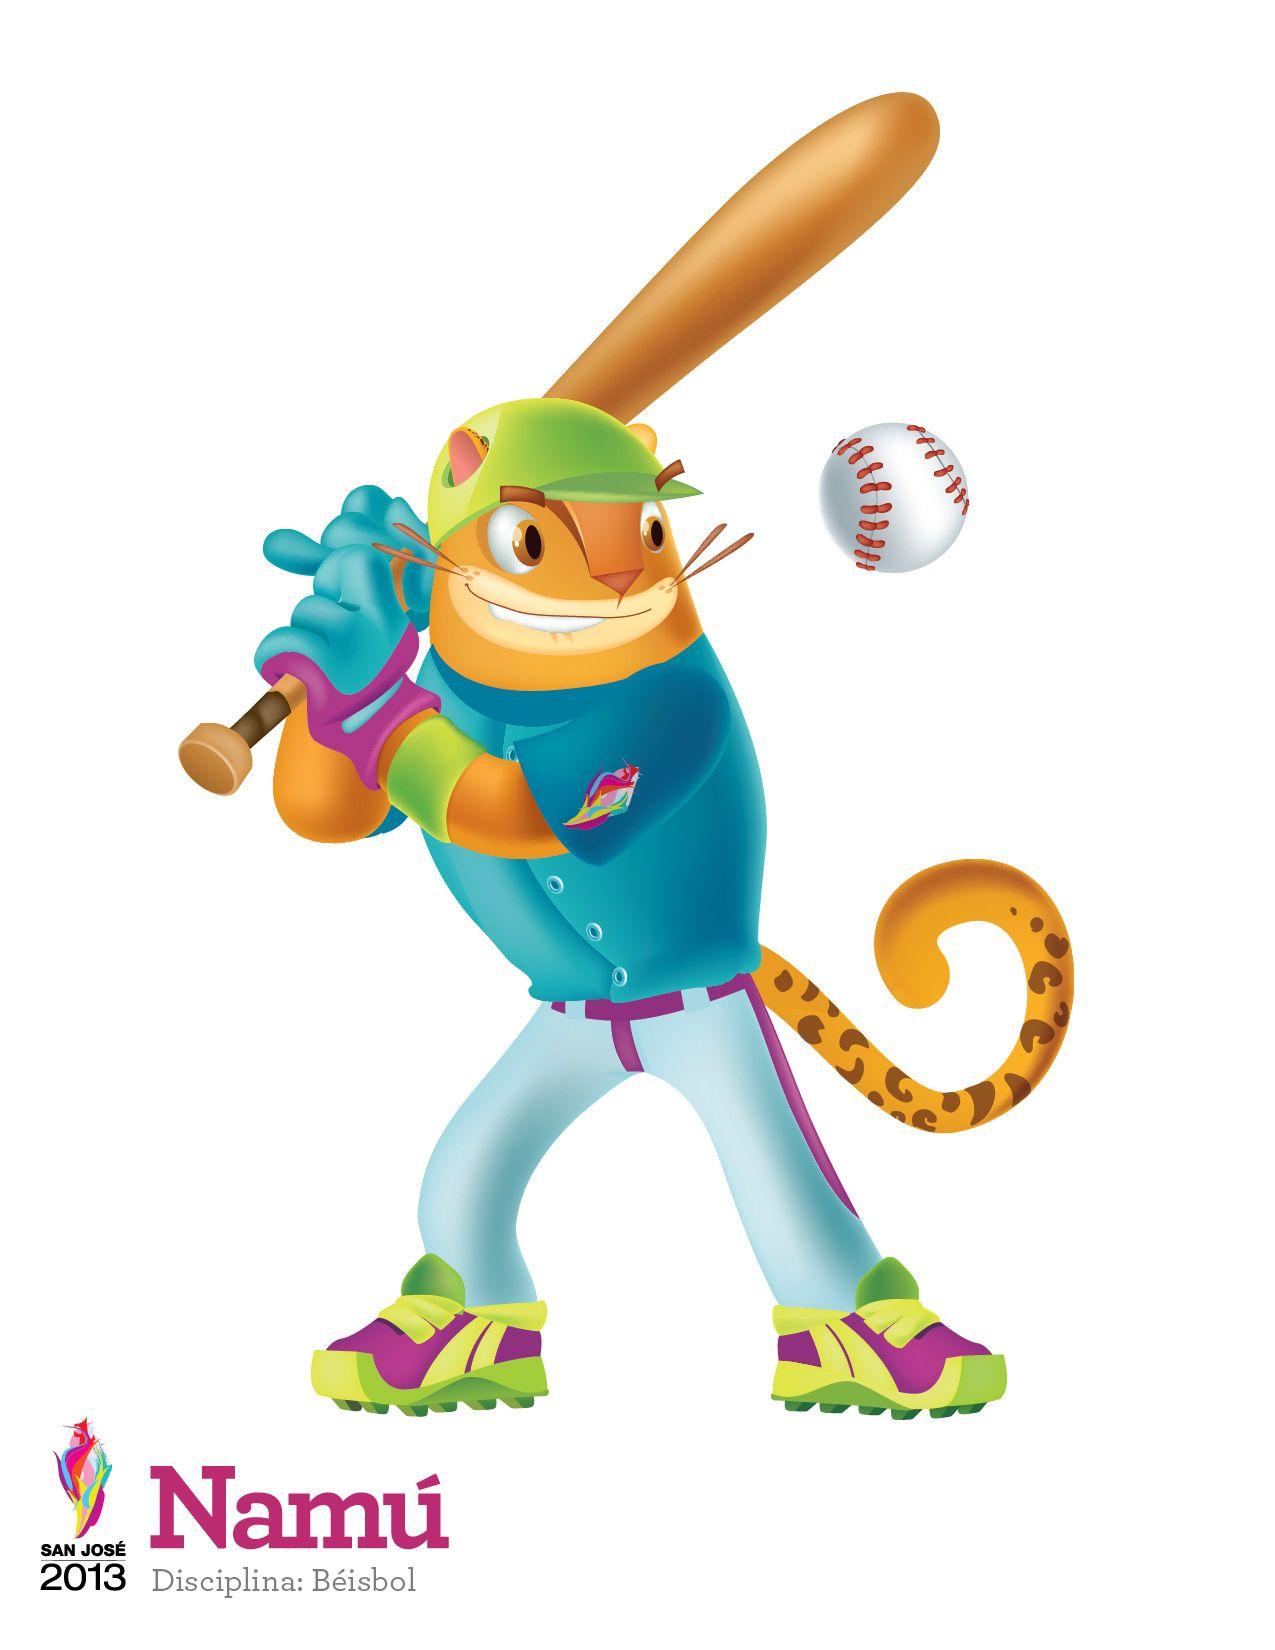 Namu Mascota De Los Juegos Centroamericanos San Jose 2013 O Disciplina Beisbol